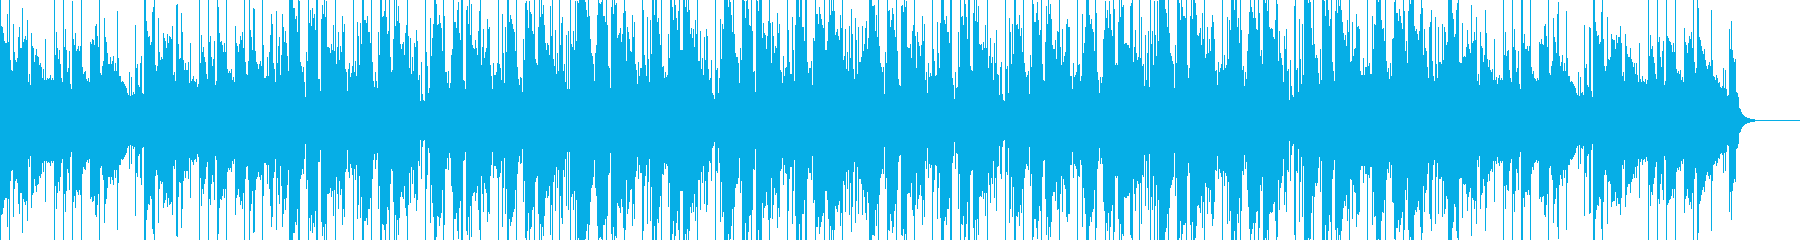 Lo-fi guitar hip hop's reproduced waveform